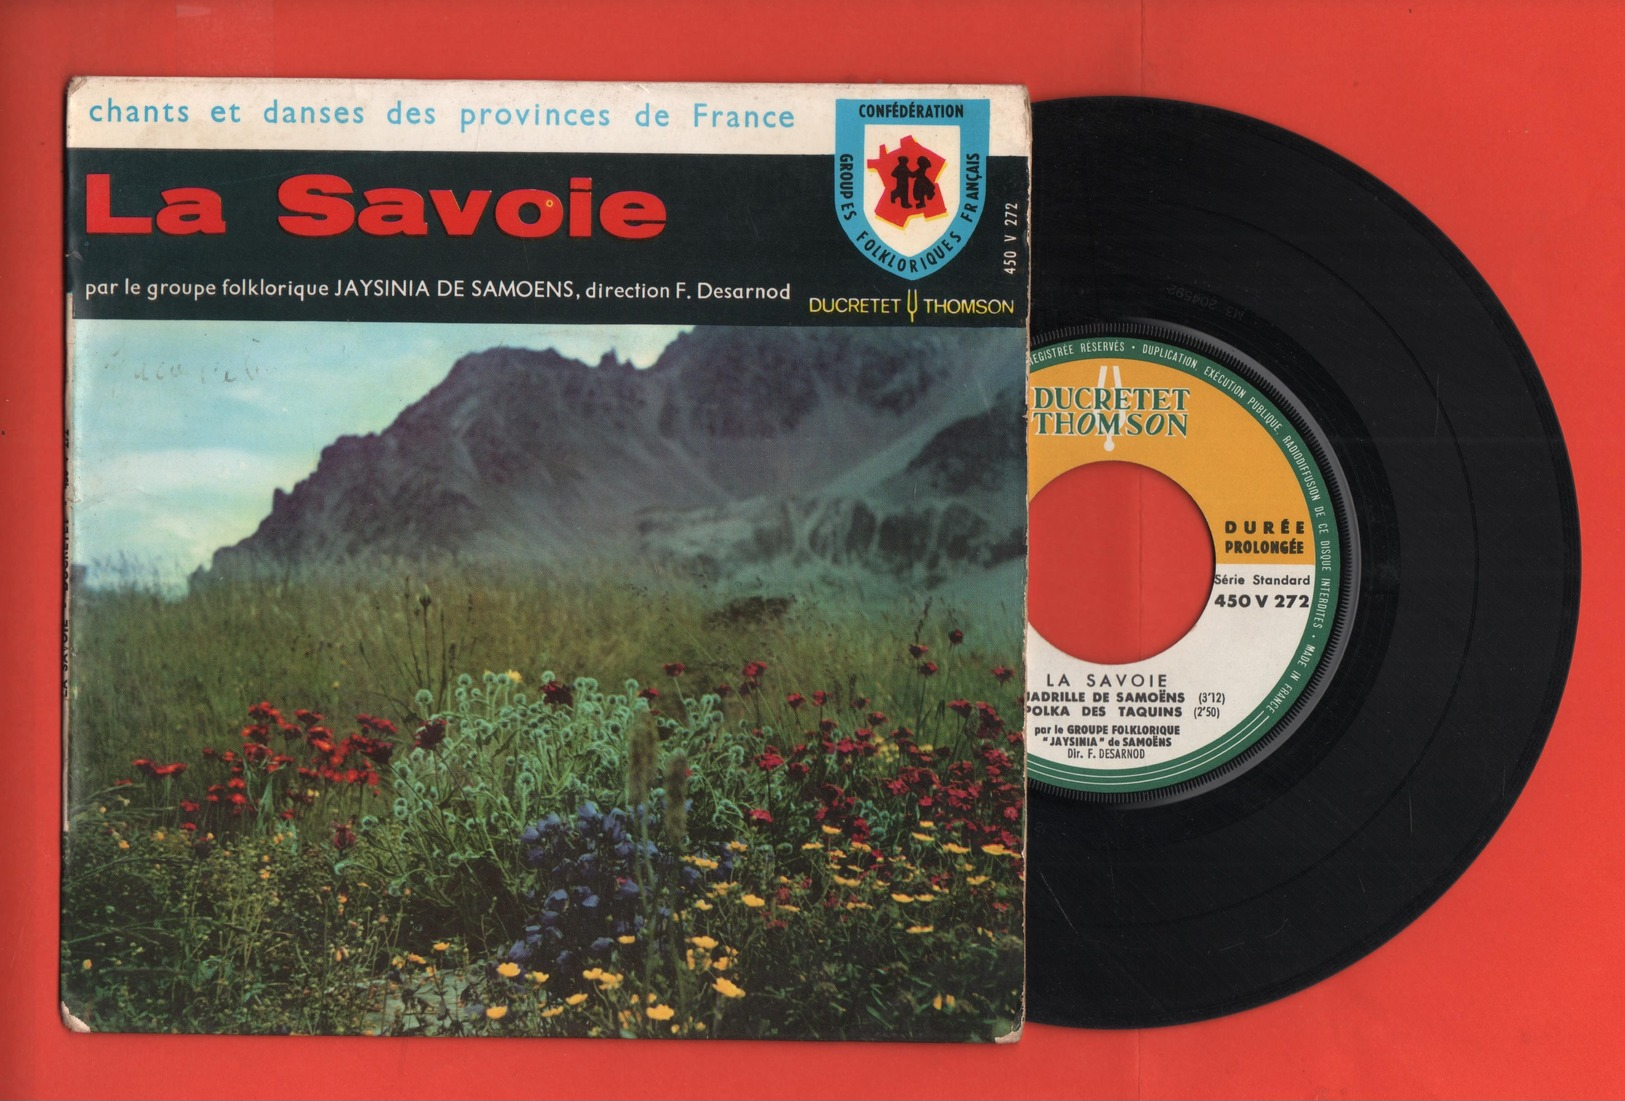 GROUPE JAYSINIA DE SAMOENS - LA SAVOIE - ECHO DE SAMOENS / JAYSINIA VALSE / LE QUADRILLE DE SAMOENS / LA POLKA DES TAQUI - Discos De Vinilo